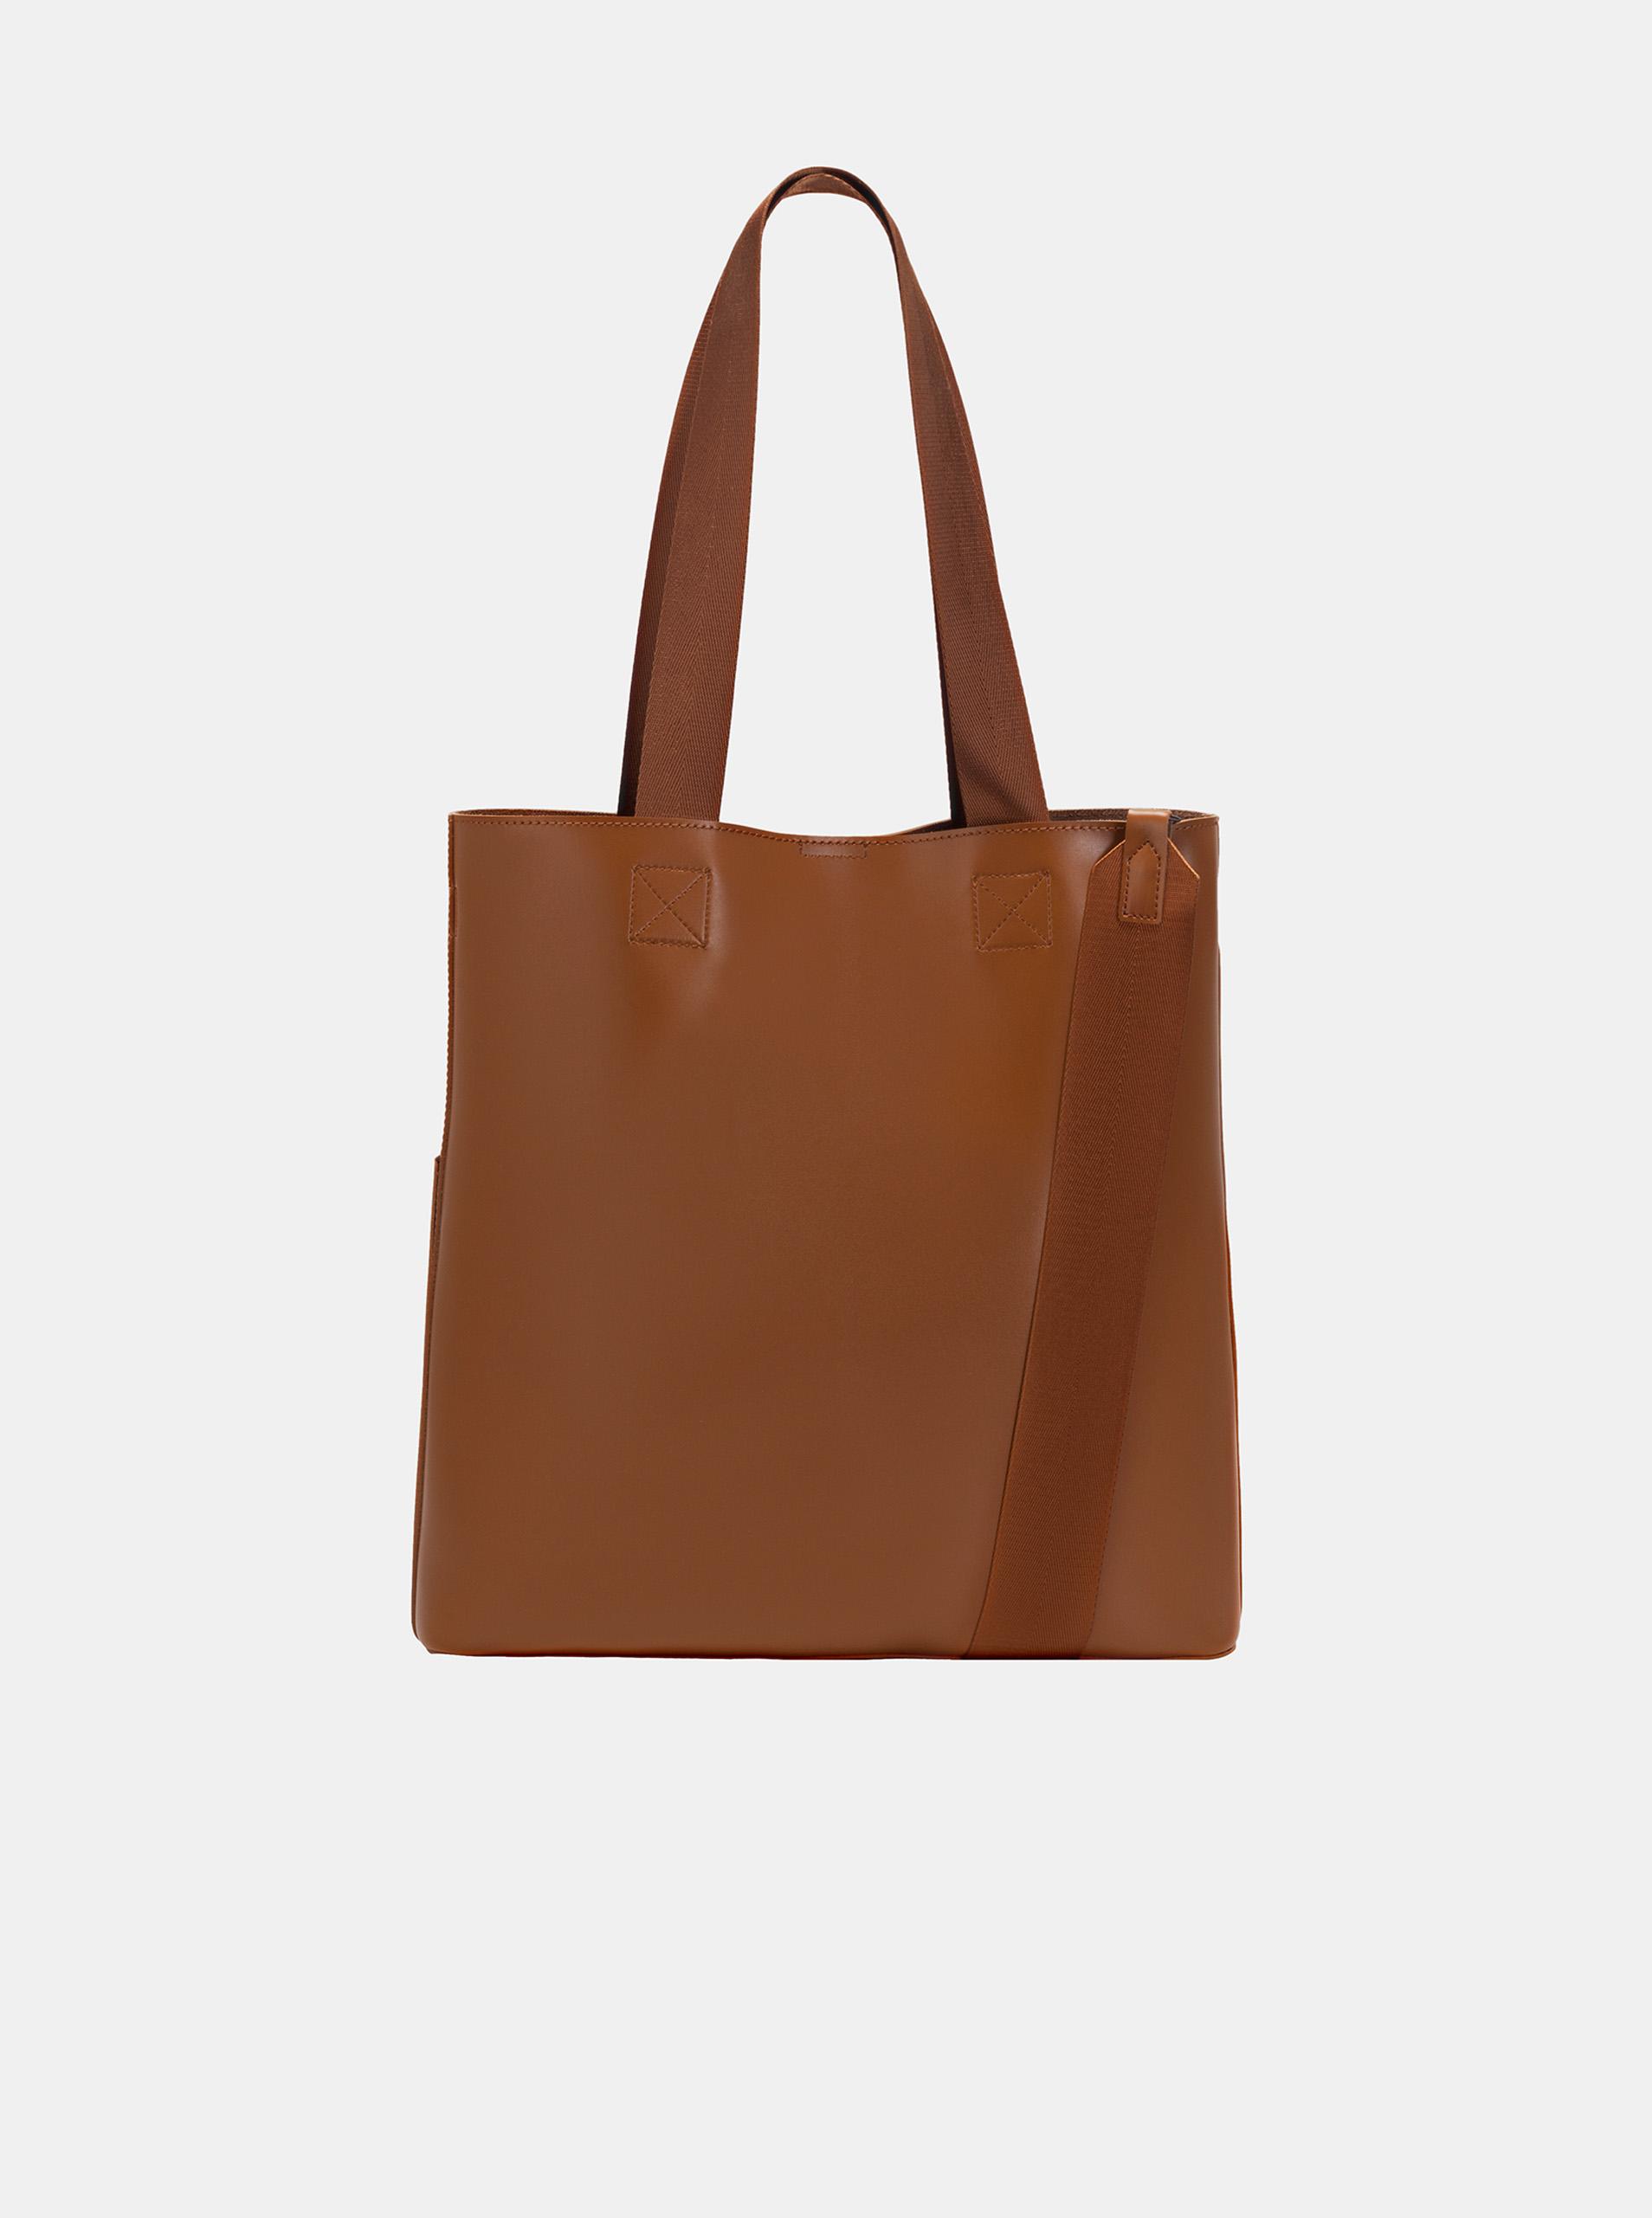 Claudia Canova brown handbag